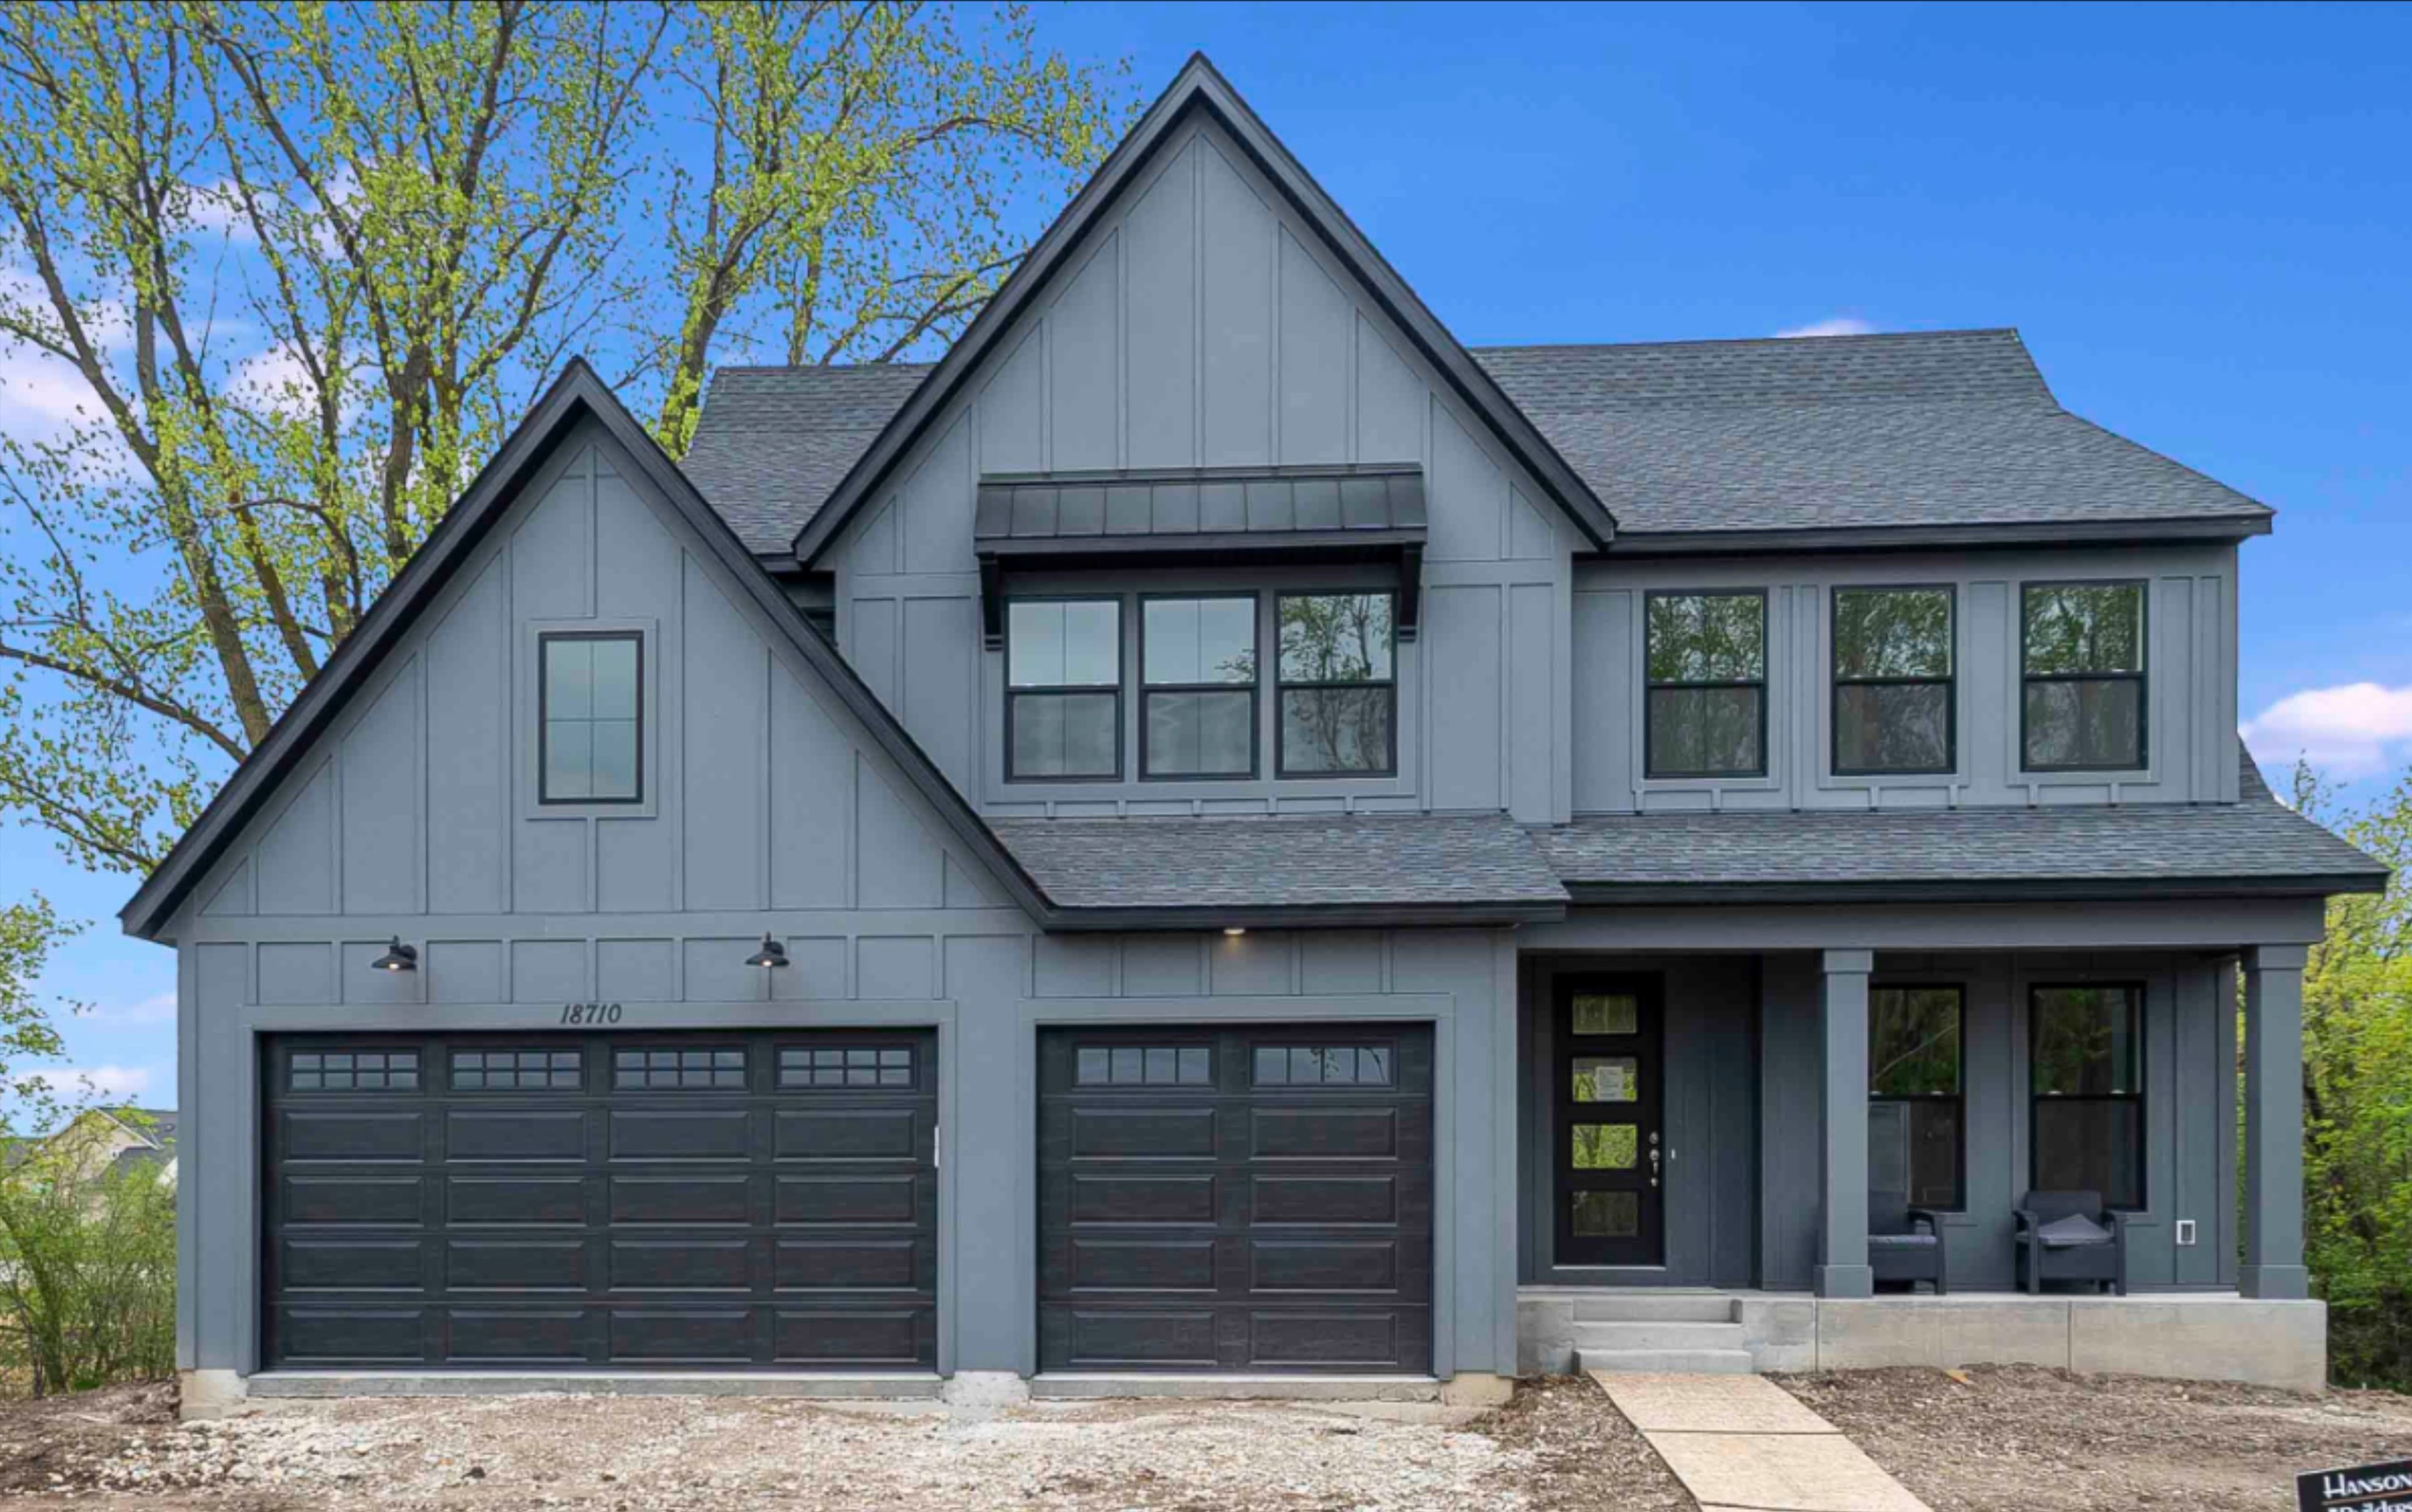 Hanson Builders Hillcrest Model In 2020 Brick Exterior House Gray House Exterior Grey Siding House